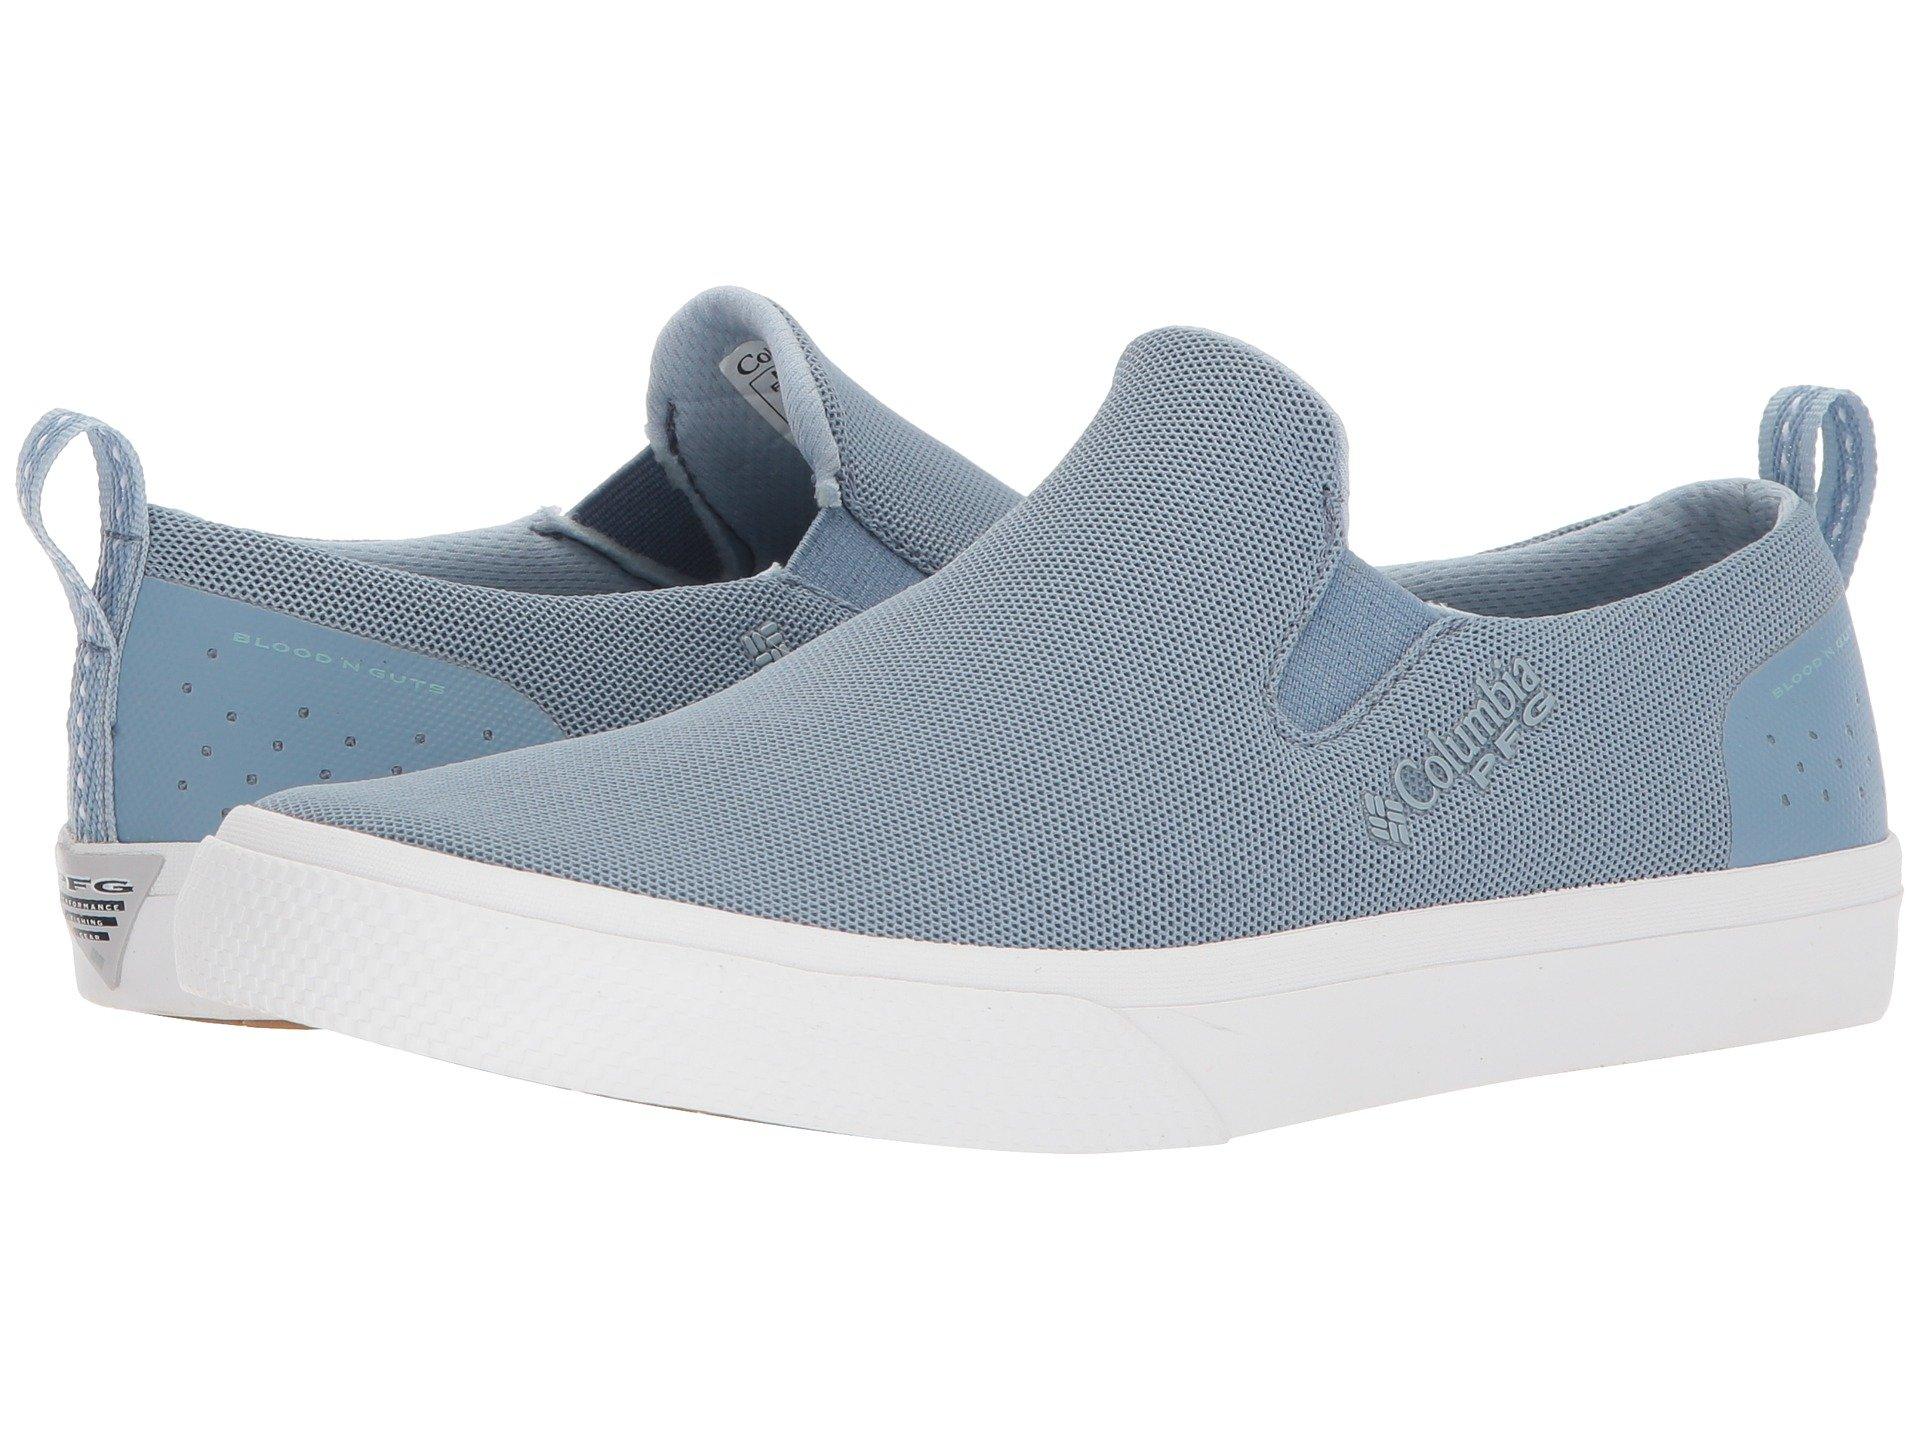 Boat Shoes para Mujer Columbia Dorado Slip PFG  + Columbia en VeoyCompro.net